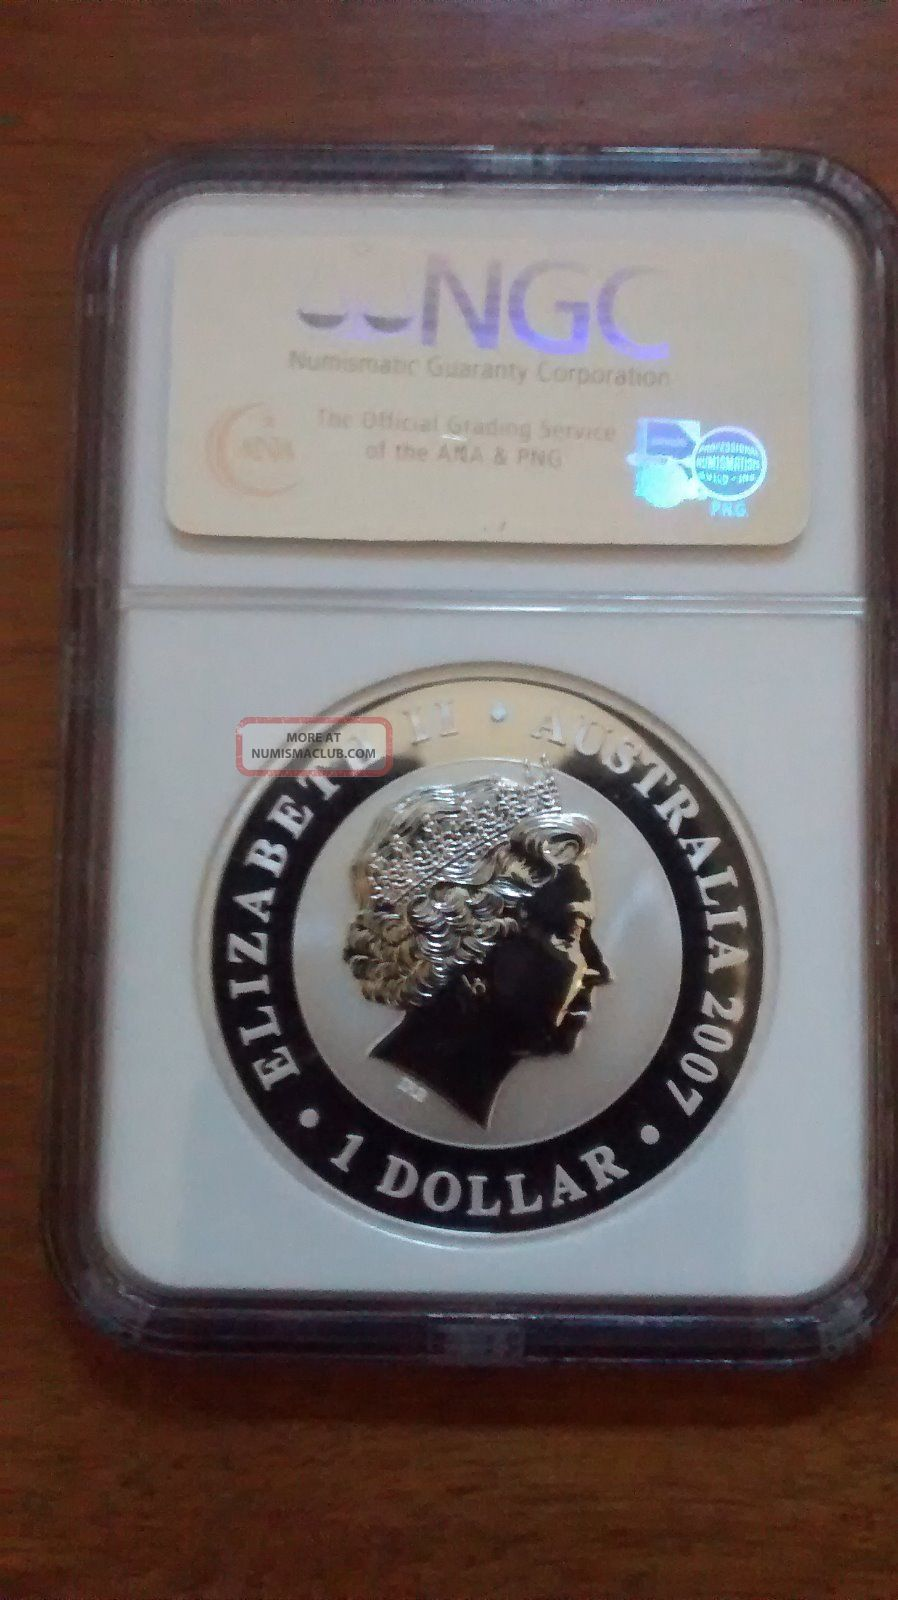 2007 Australia Koala 1 Oz 999 Silver Coin Ngc Ms 69 First